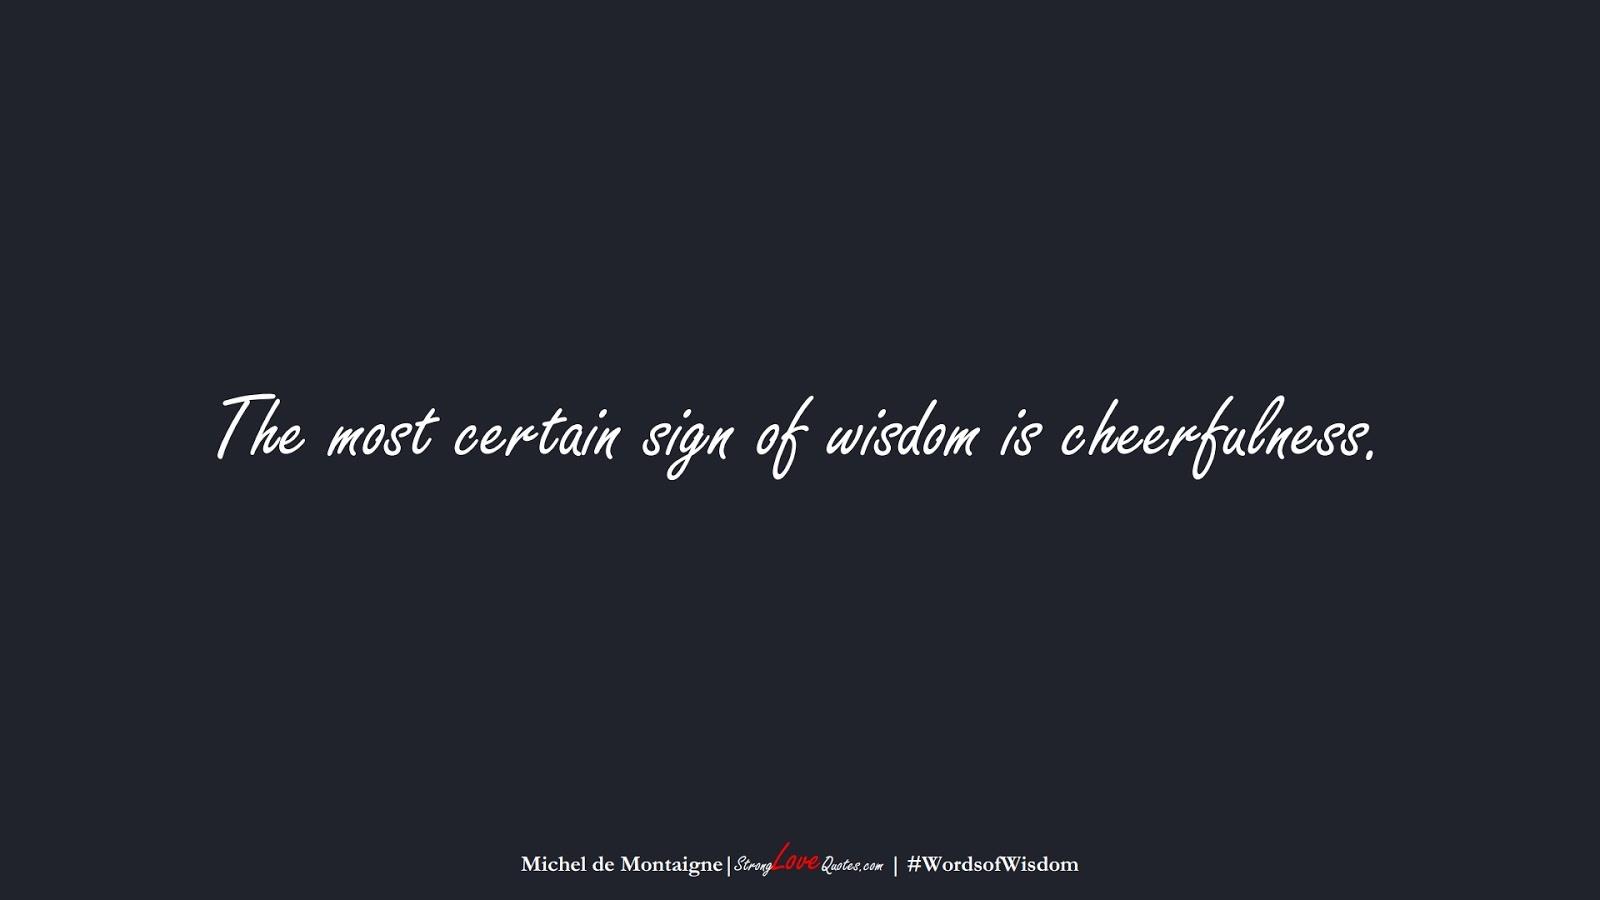 The most certain sign of wisdom is cheerfulness. (Michel de Montaigne);  #WordsofWisdom